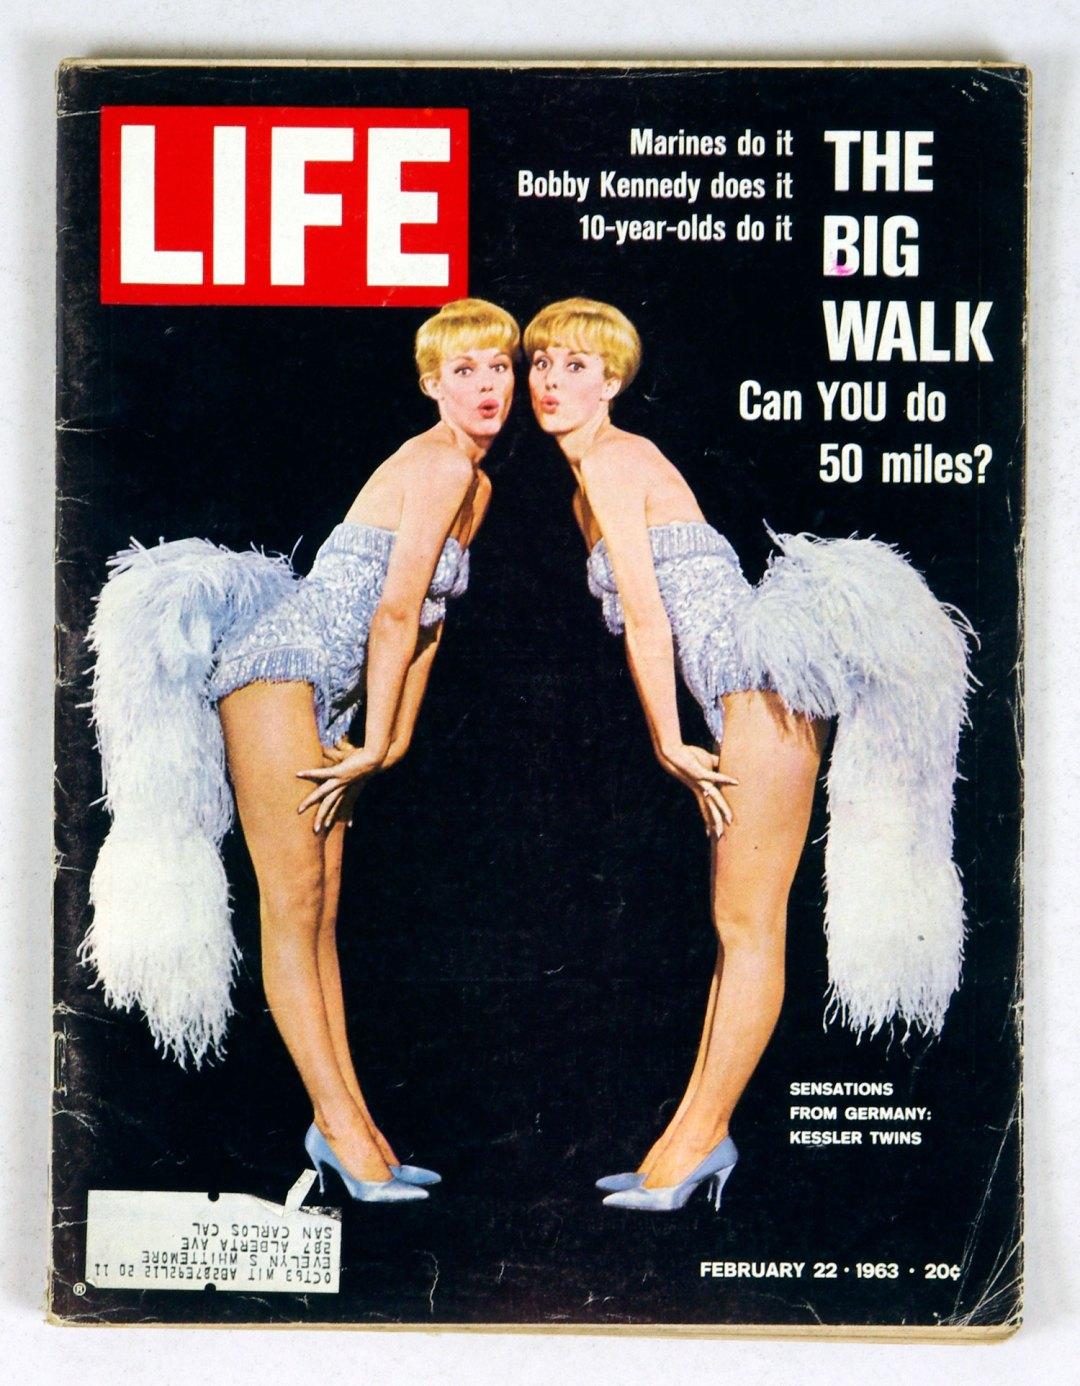 LIFE Magazine 1963 February 22 Sensations from Germany Kessler Twins